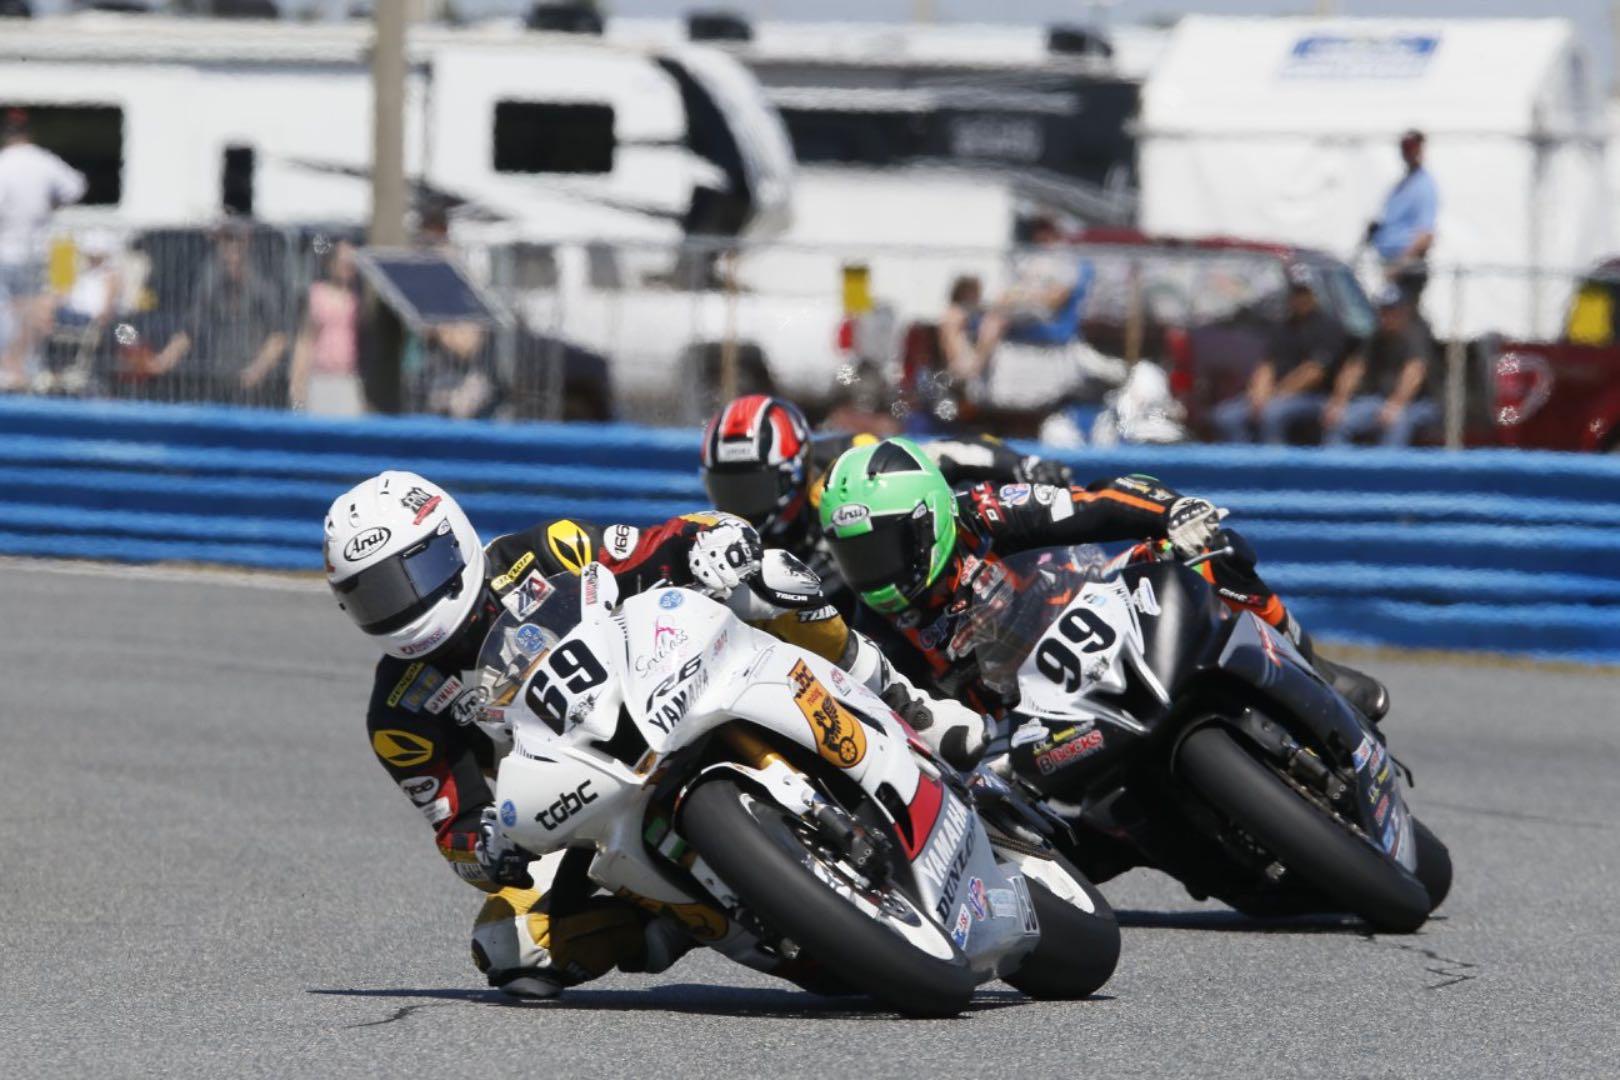 Danny Eslick leading 2018 Daytona 200